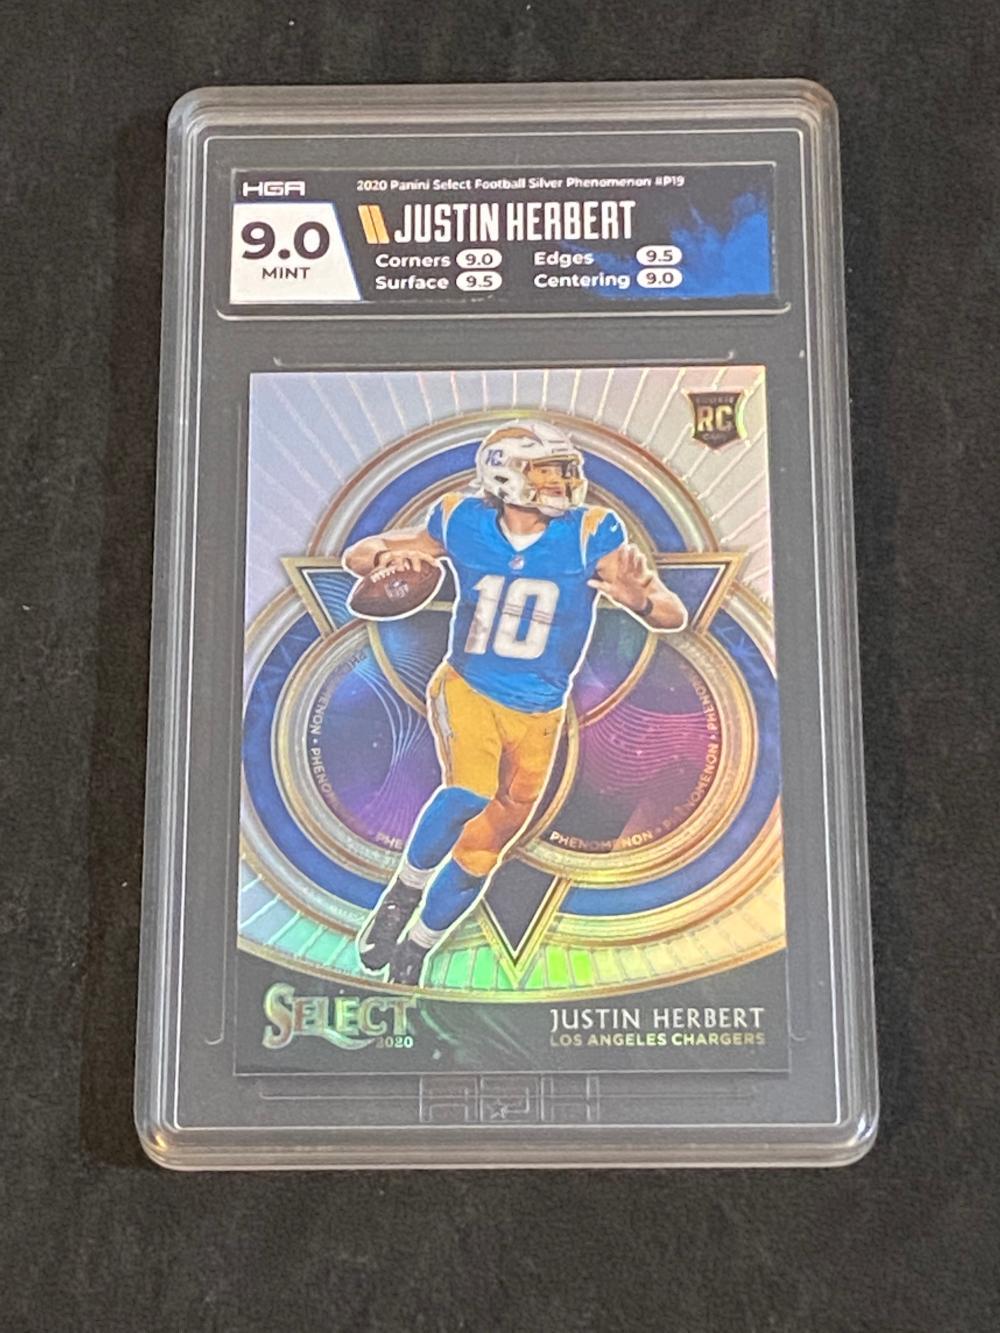 HGA 9 (Mint) 2020 Select RC Silver Prizm Justin Herbert Rookie #P19 Football Card